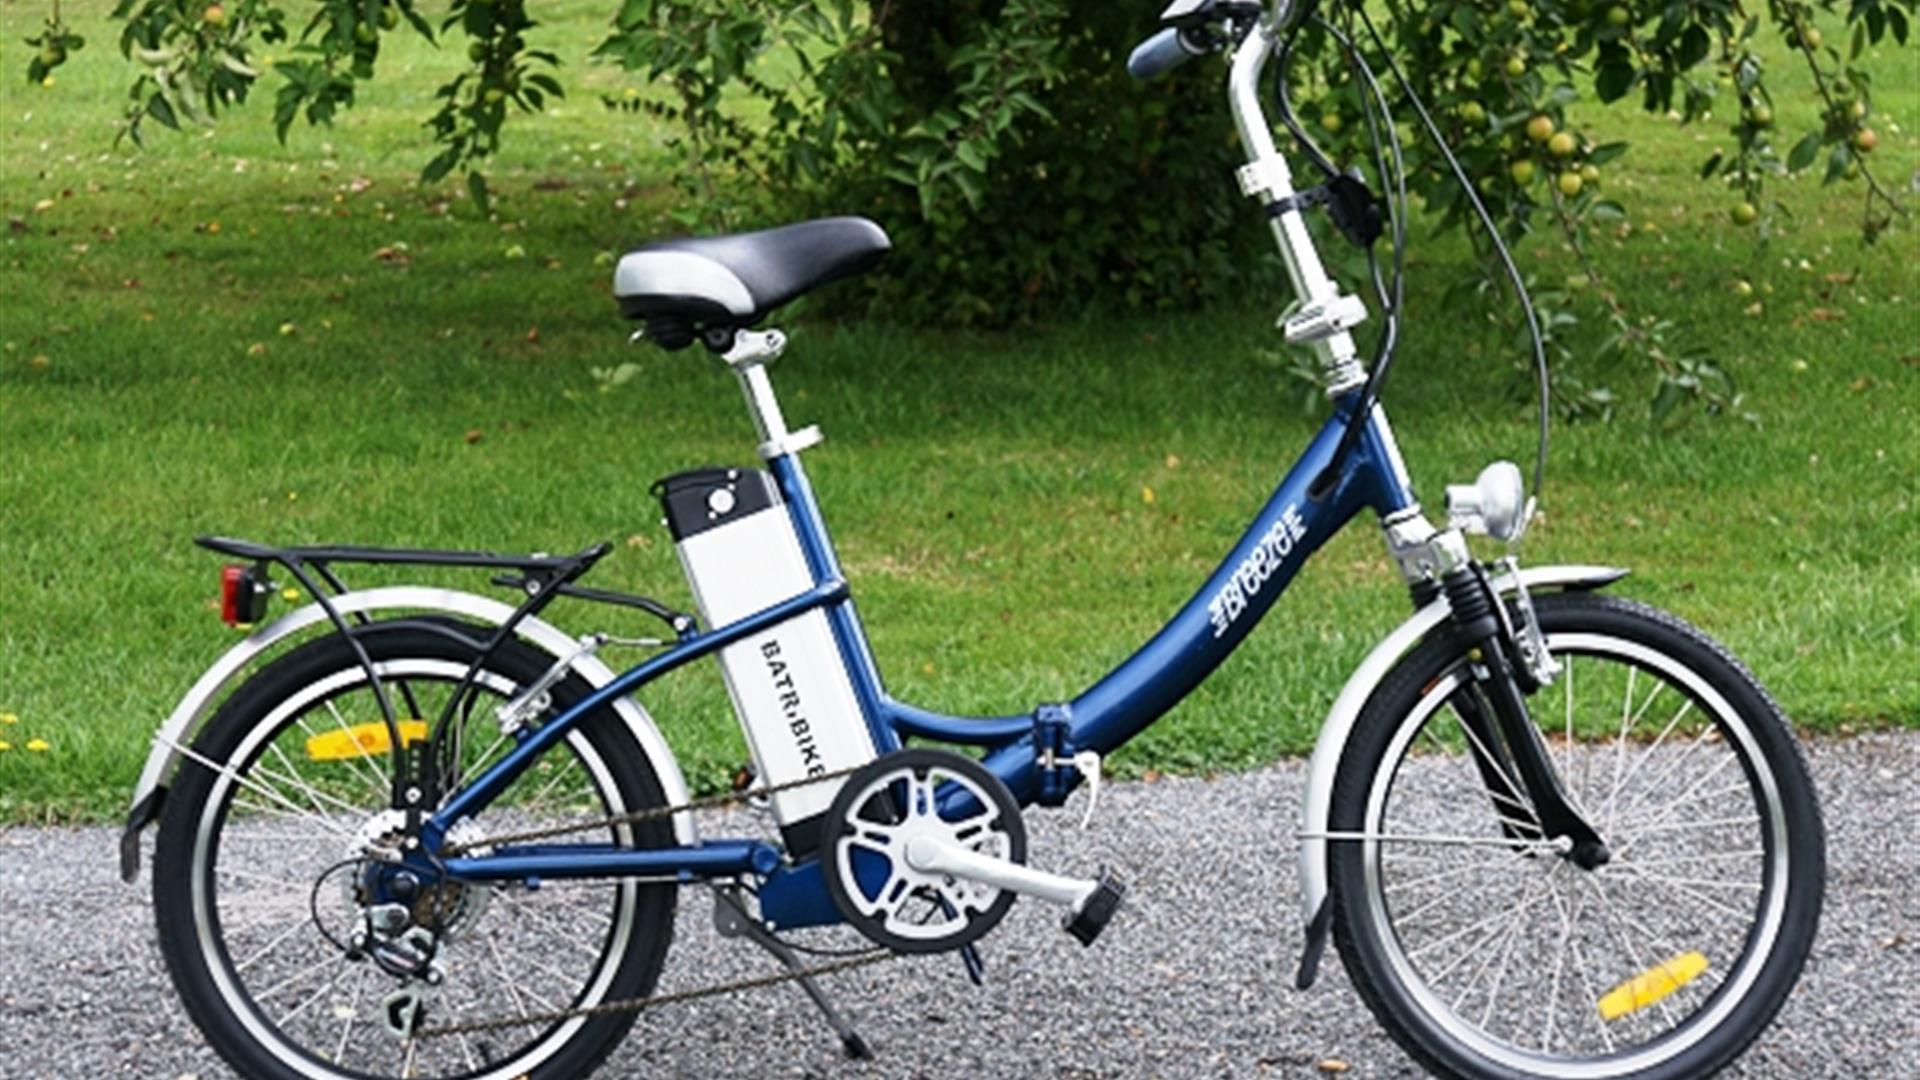 Downshire Leisure - E Electric bike sales & hire